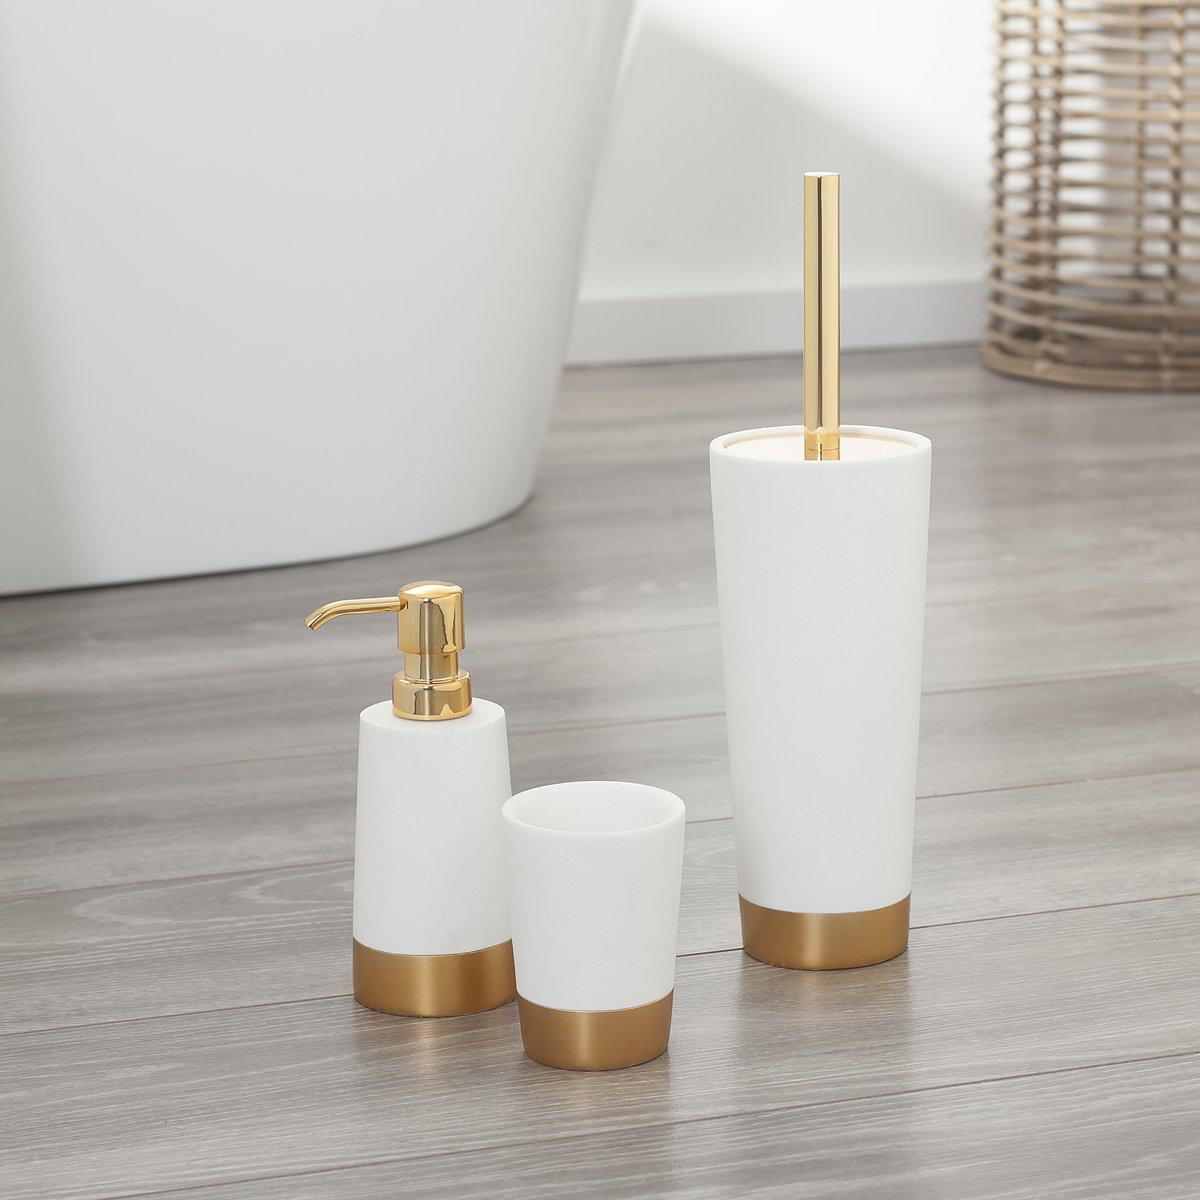 Argento Sealskin Glossy Scopino e Portascopino da WC Set 33,6 x 9,5 x 9,5 cm Poliresina